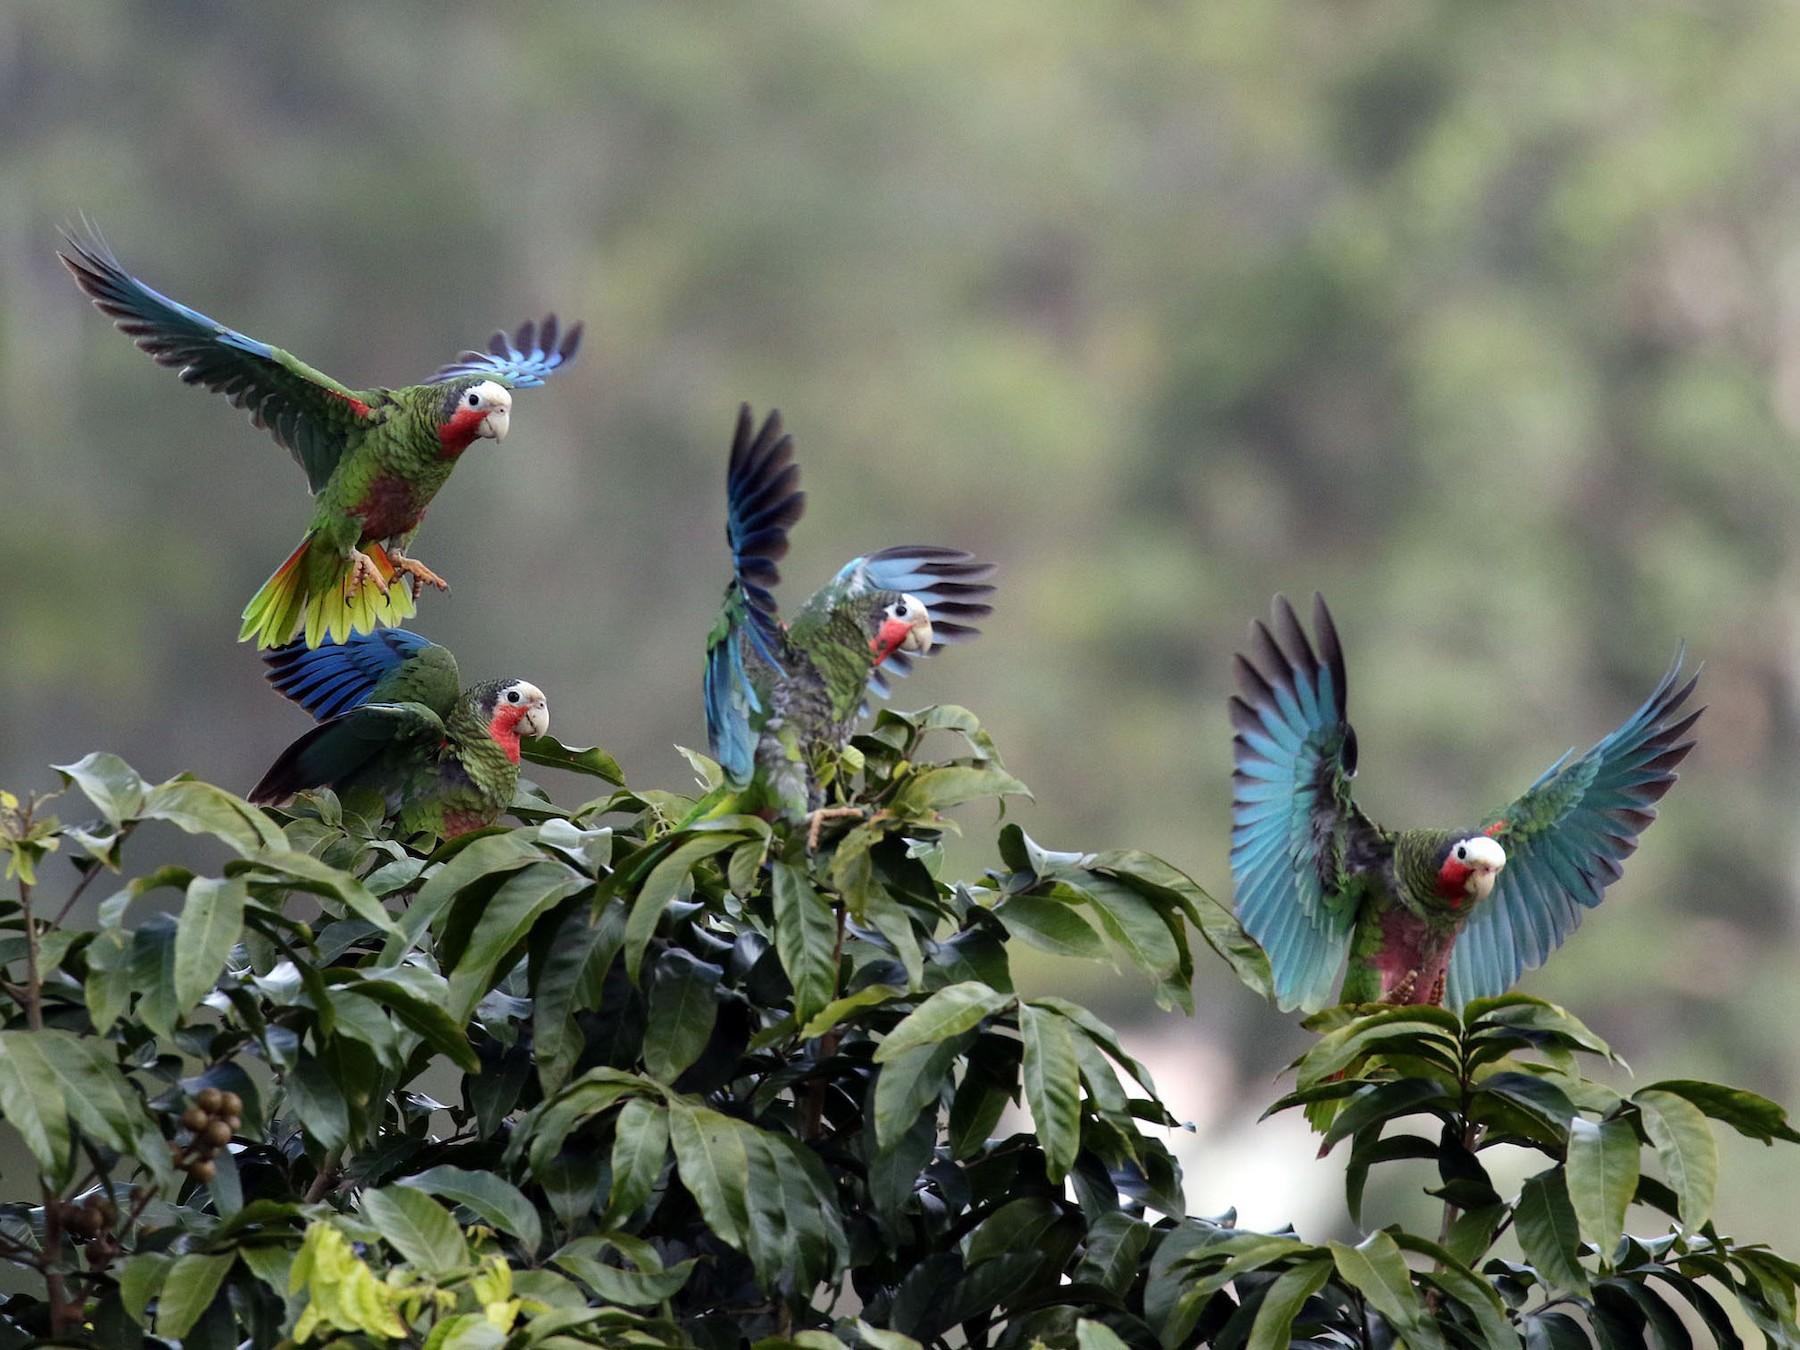 Cuban Parrot - Arturo Kirkconnell Jr